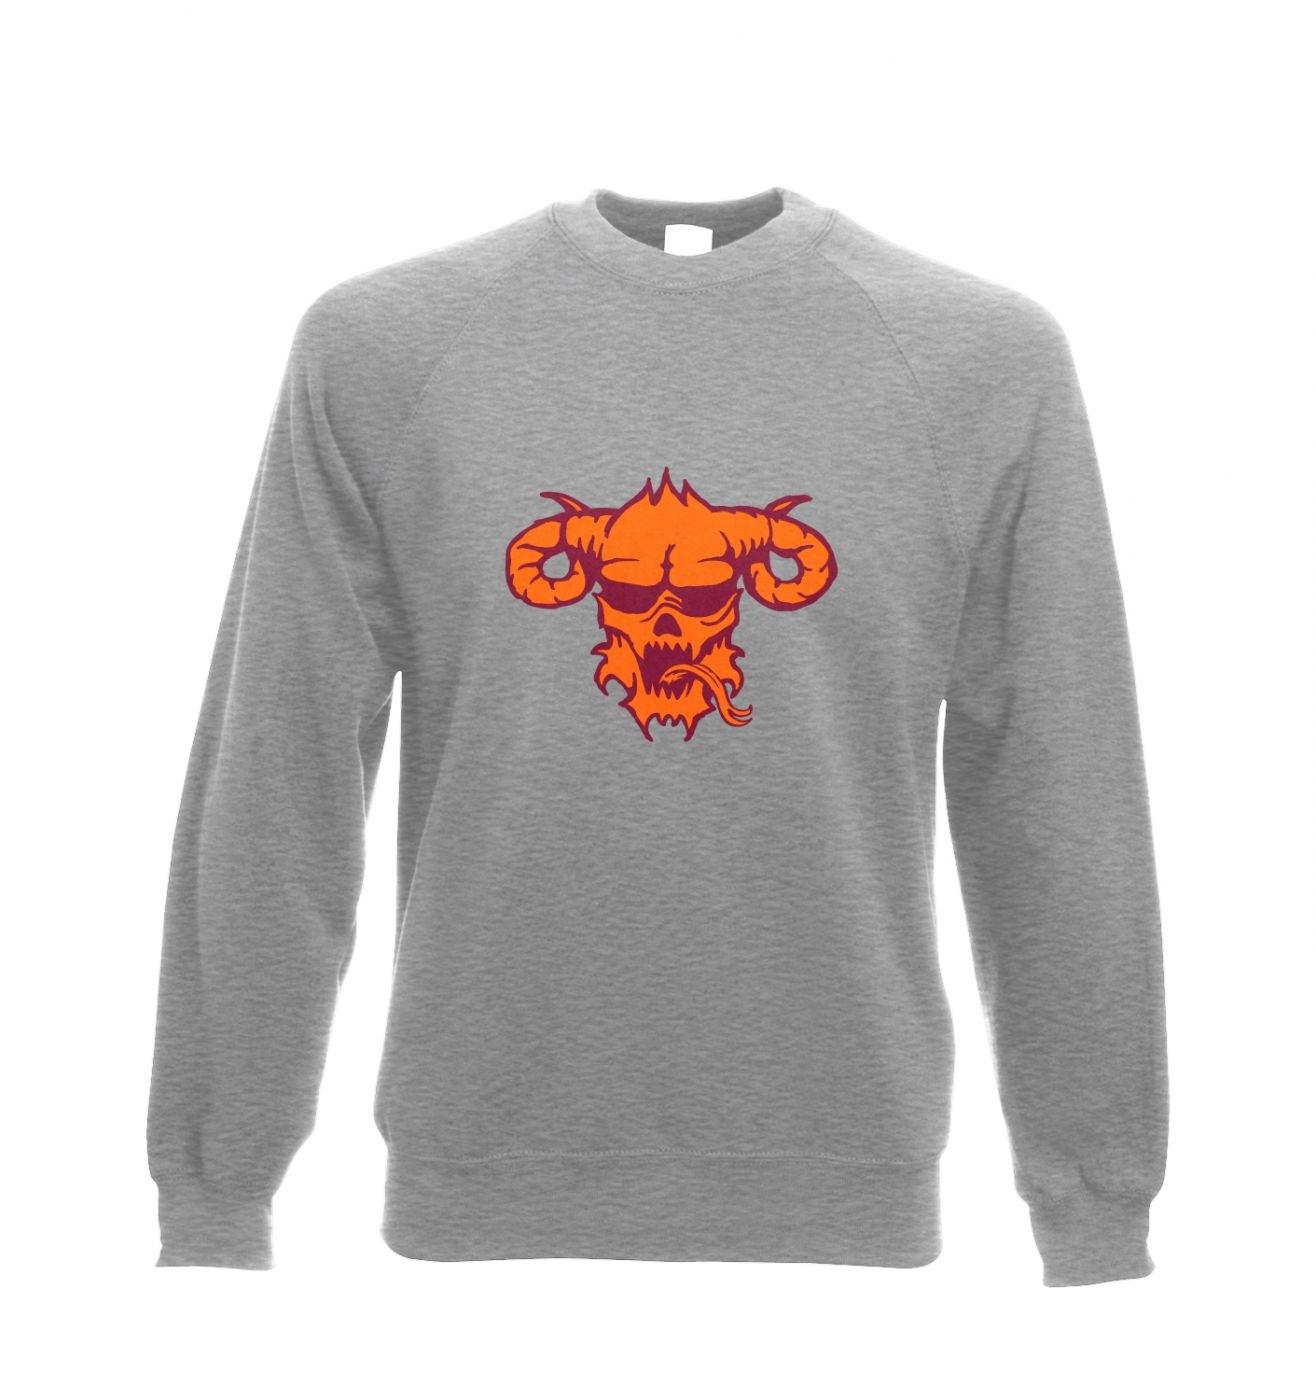 Orange Demon's Head adults' crewneck sweatshirt